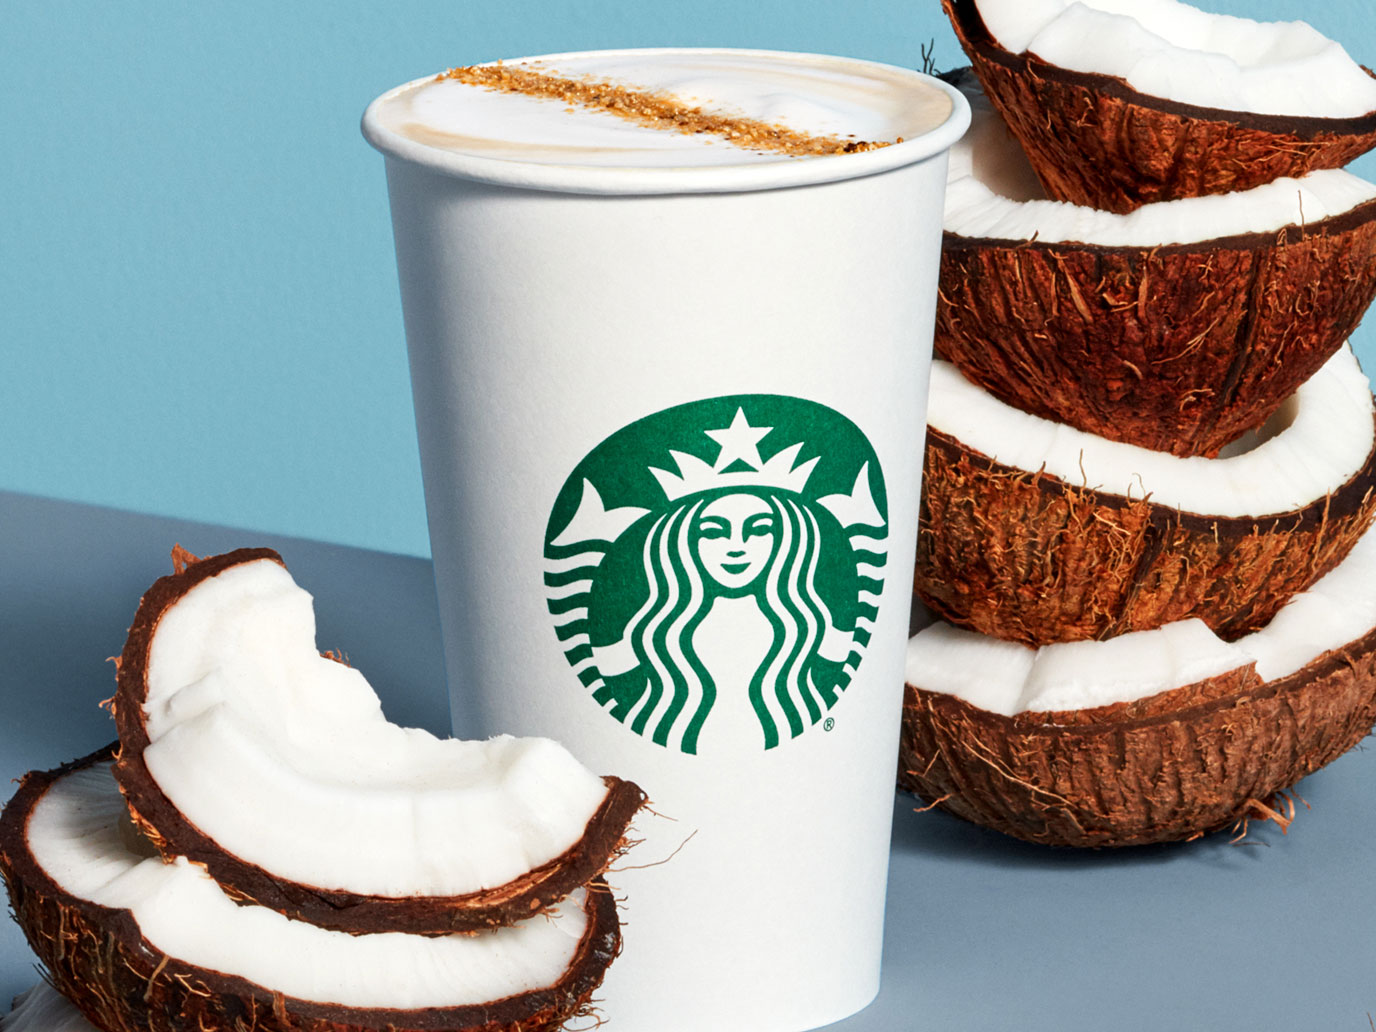 Starbucks non-dairy drinks